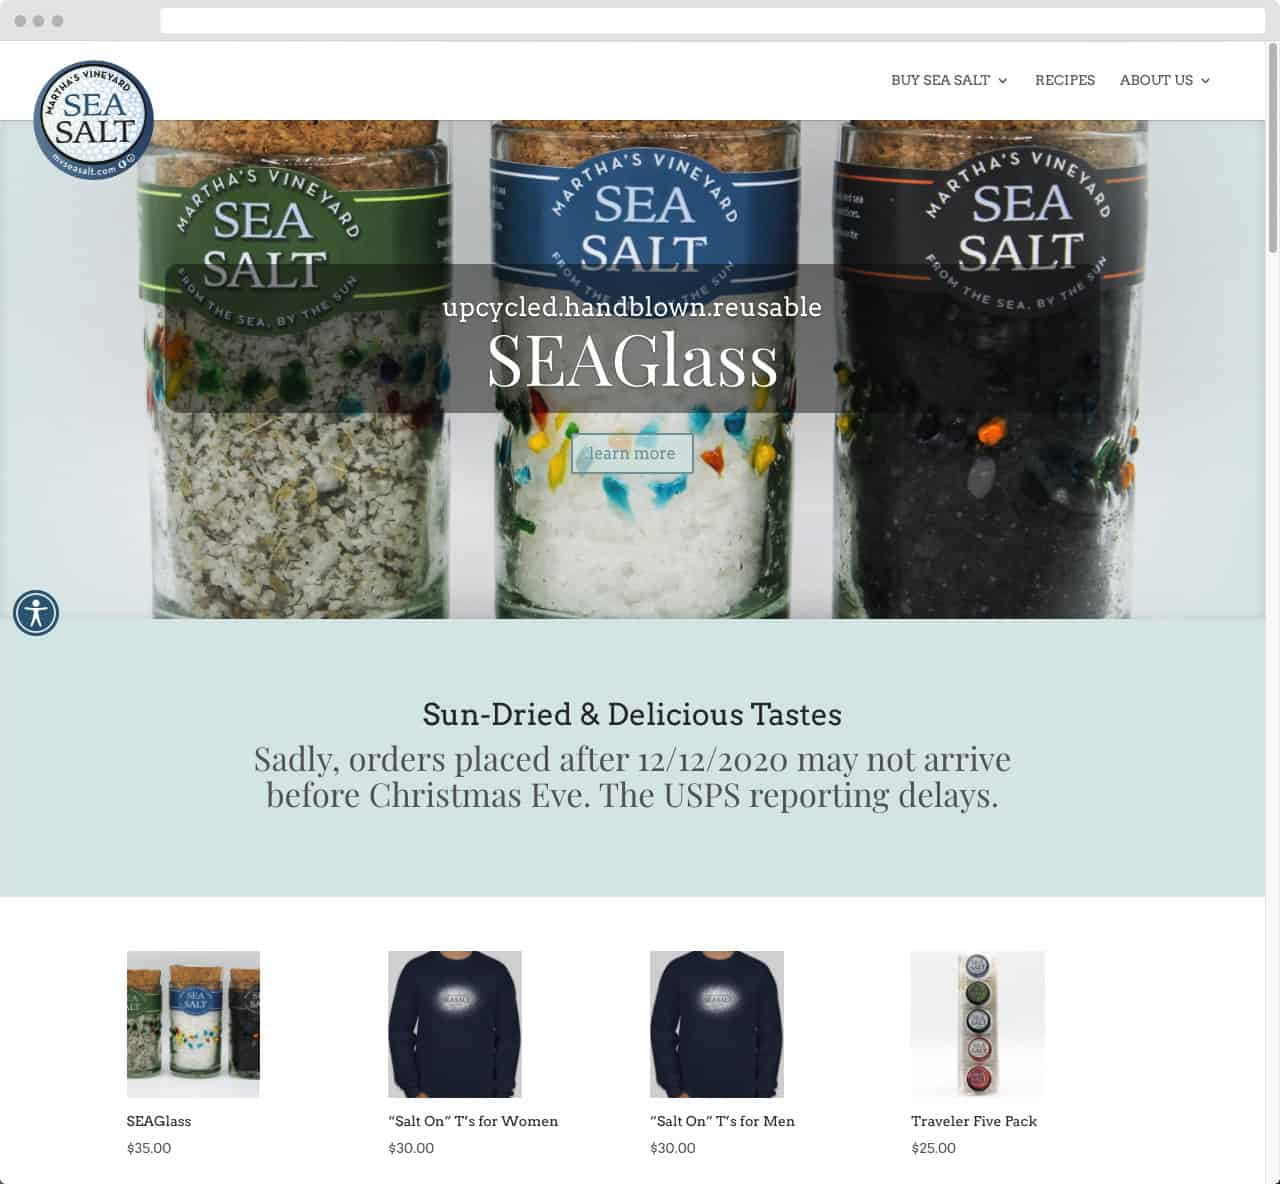 Martha's Vineyard Sea Salt